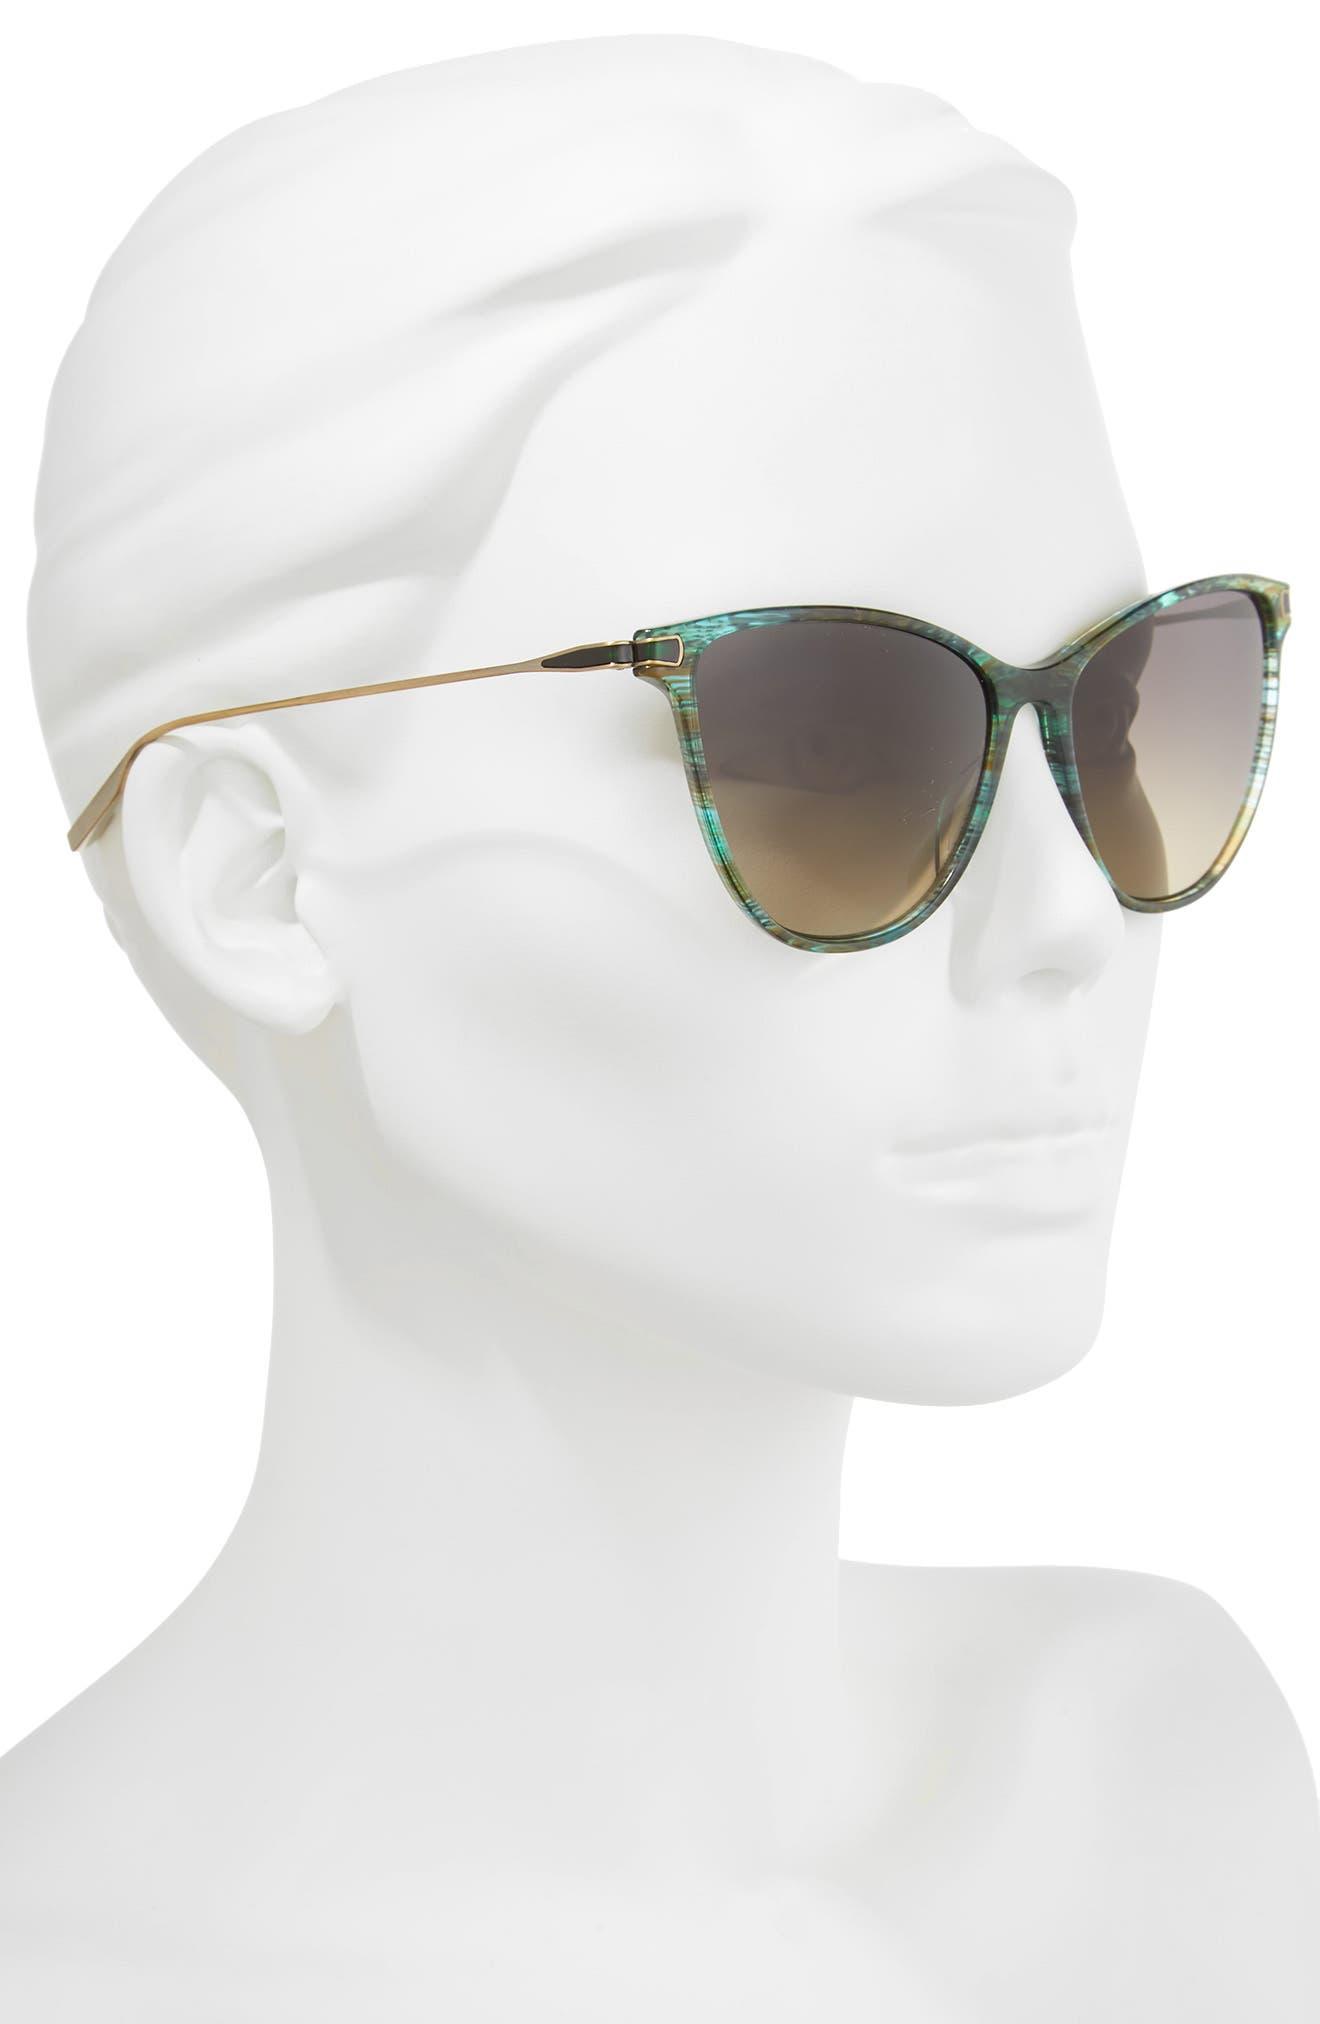 SALT.,                             Nia 58mm Polarized Cat Eye Sunglasses,                             Alternate thumbnail 2, color,                             300